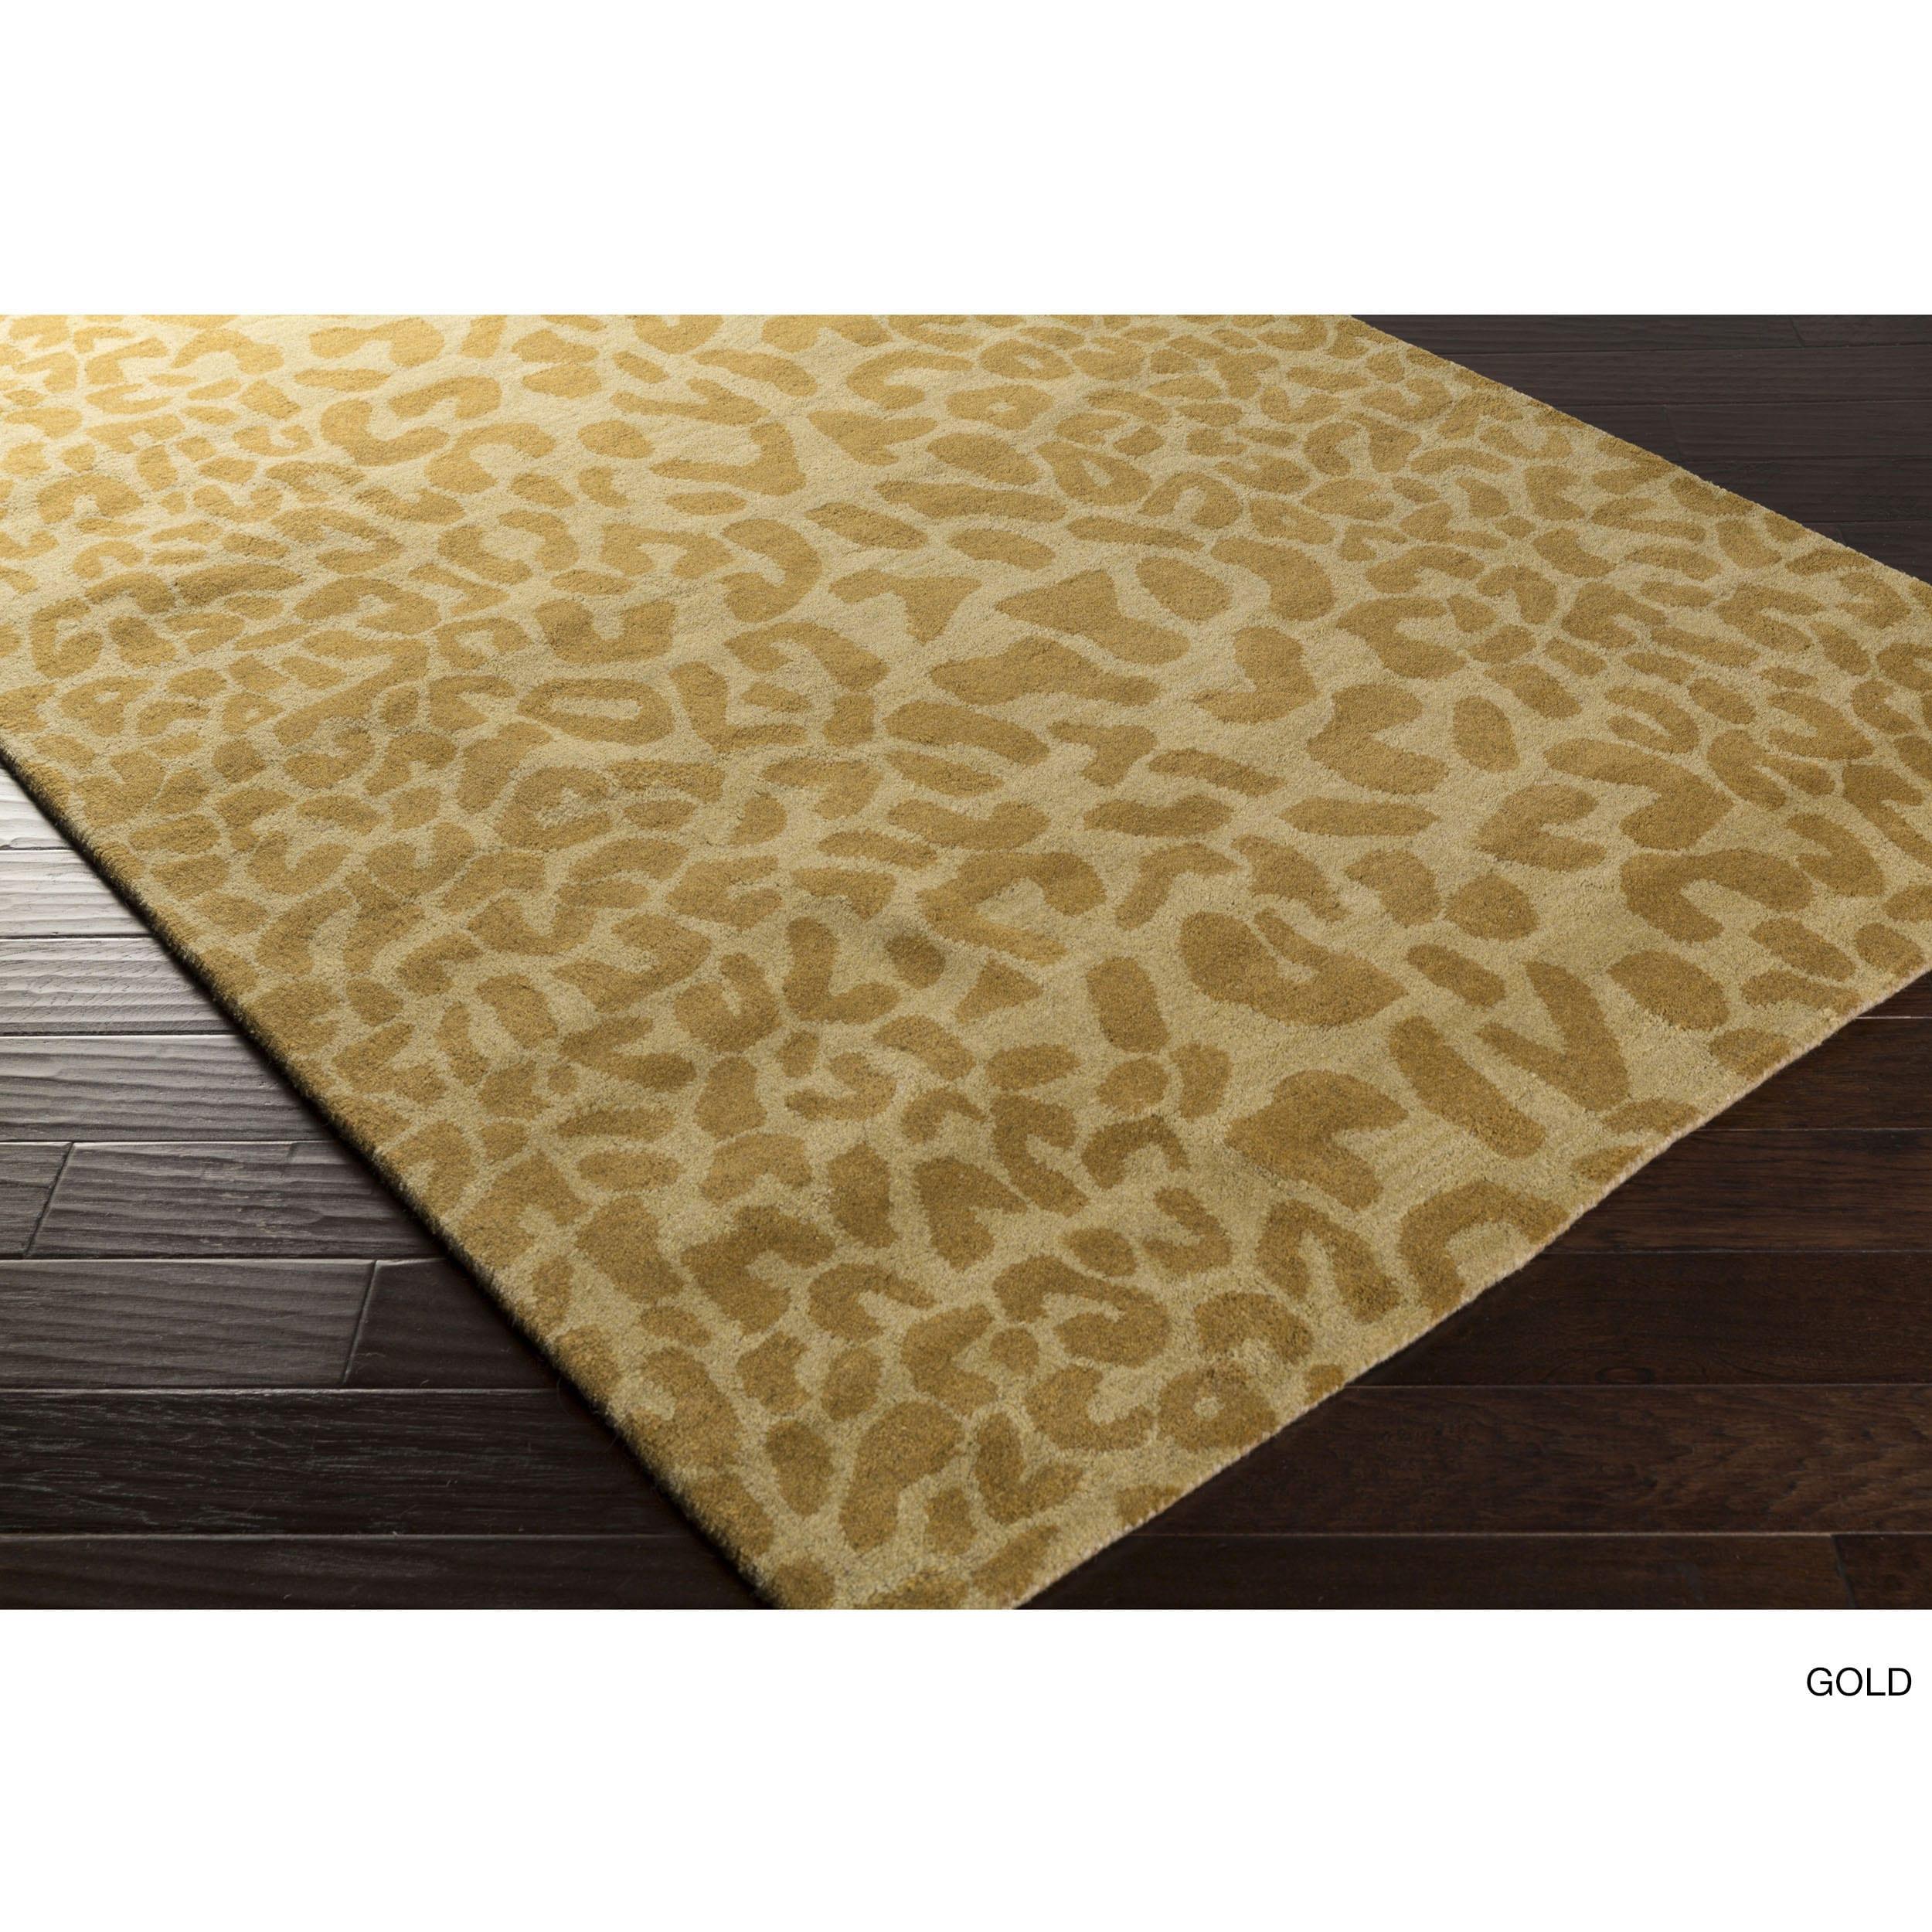 west bird or anatolia selendi ushak lot rug cks century details lotfinder a early late leopard